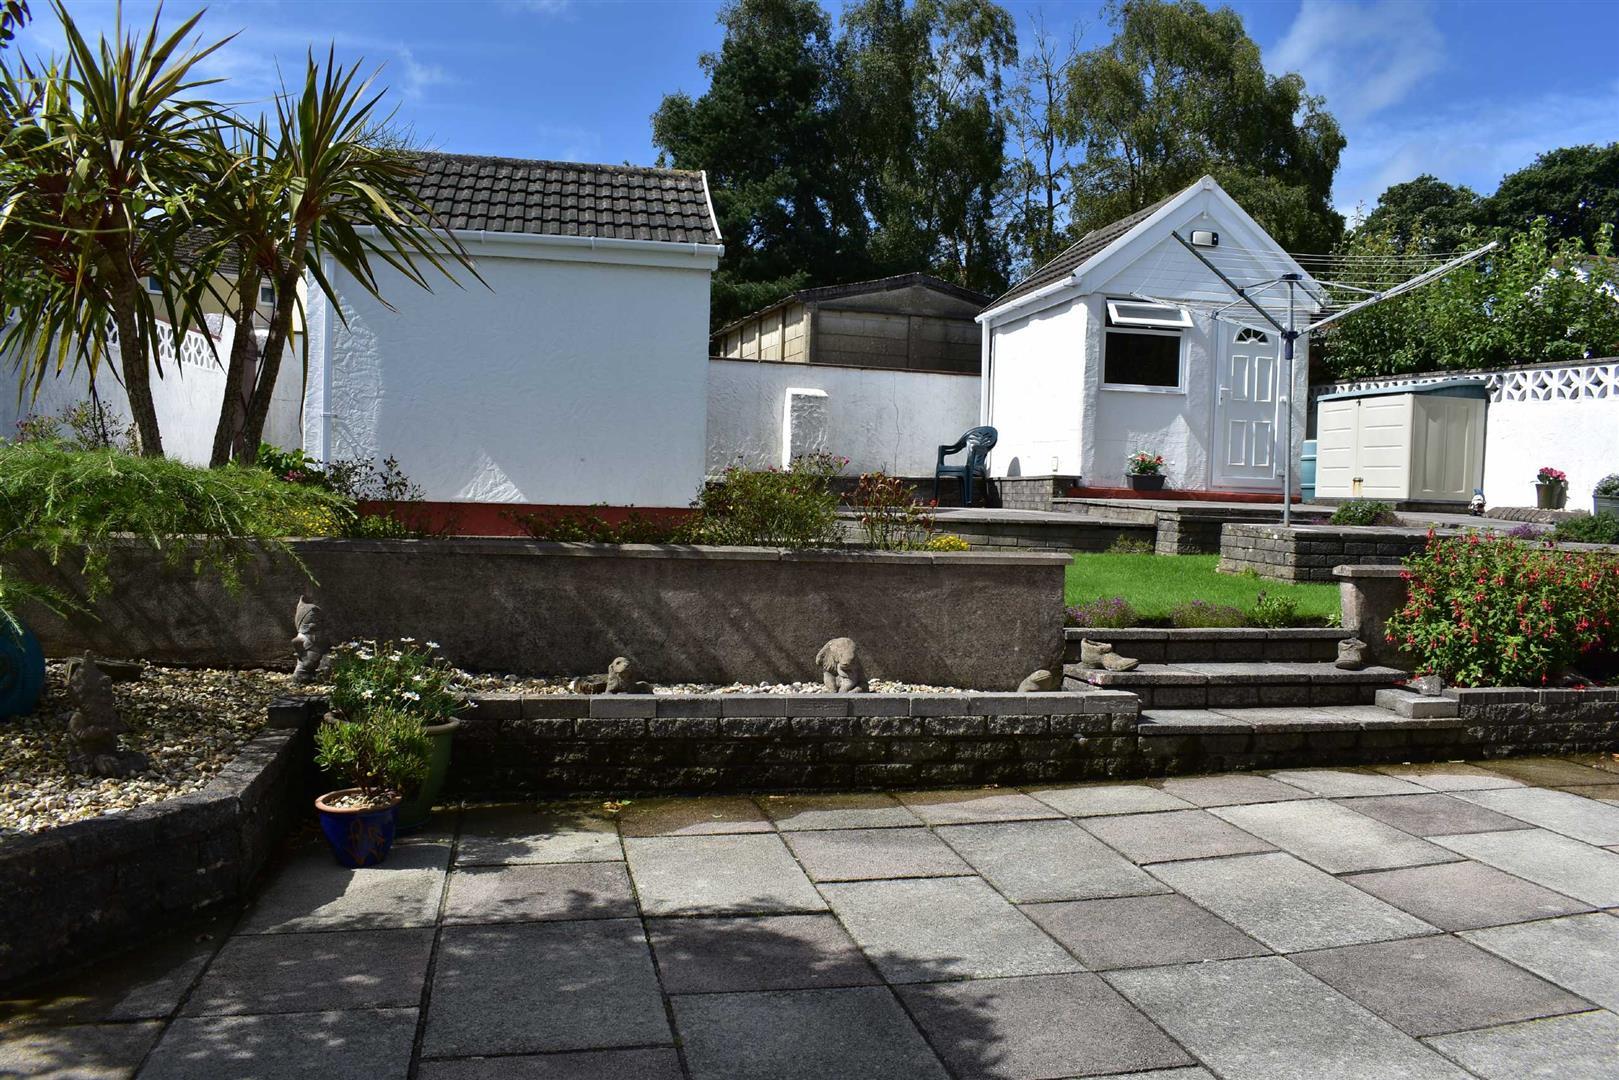 Maytree Avenue, West Cross, Swansea, SA3 5NB